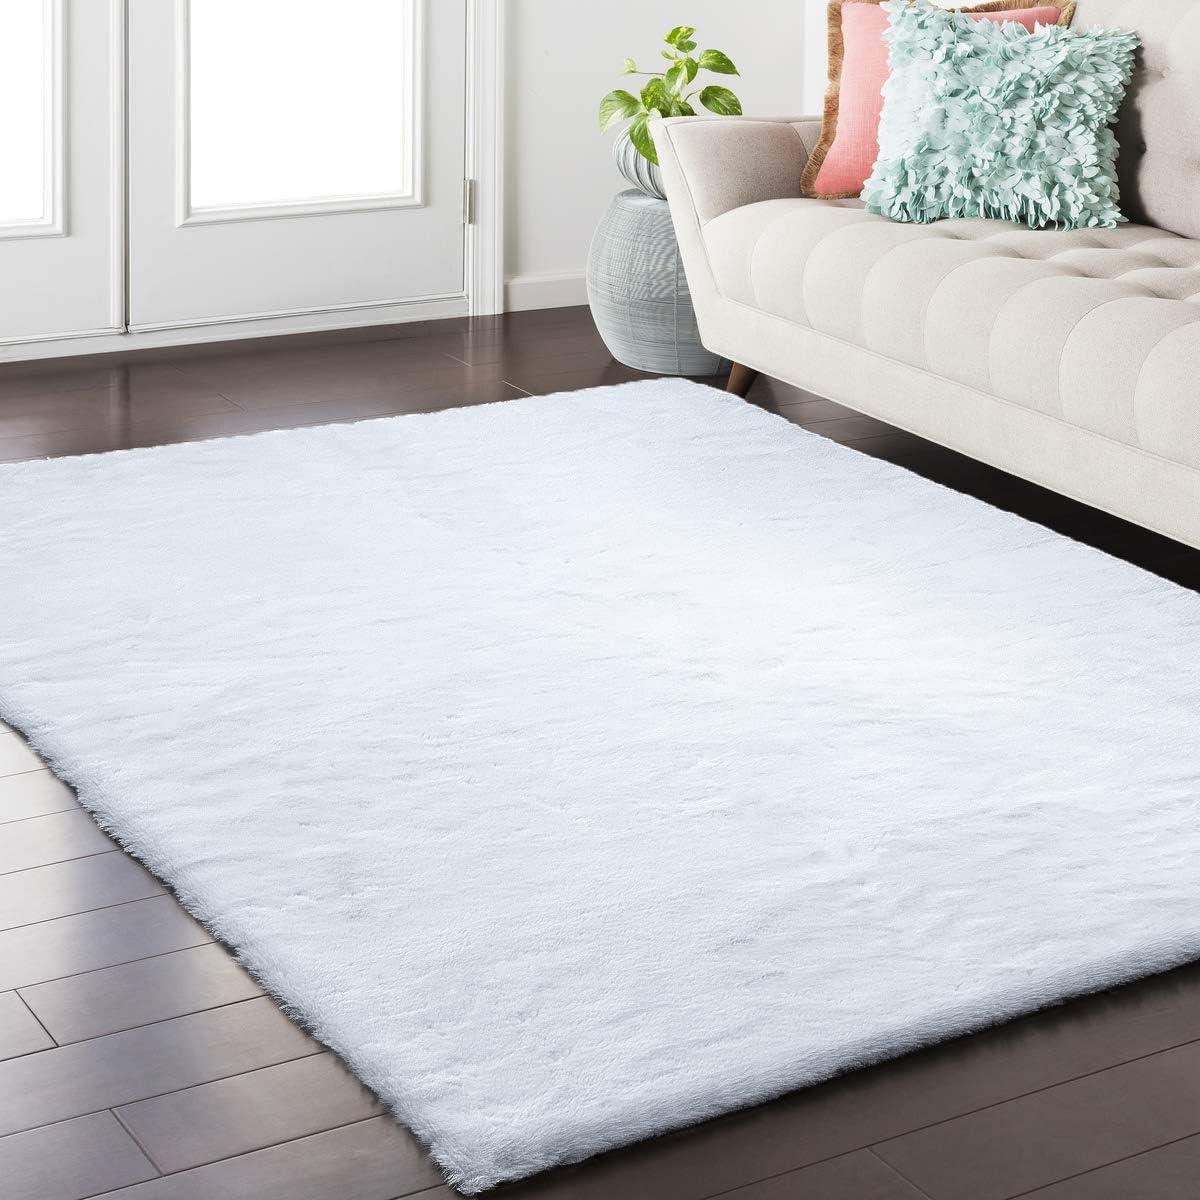 Softlife Fluffy Faux Fur Rug 4 x 6 Soft Area Rugs for Bedroom Girls Room Living Room Home Decor Floor Carpets, White Rectangle